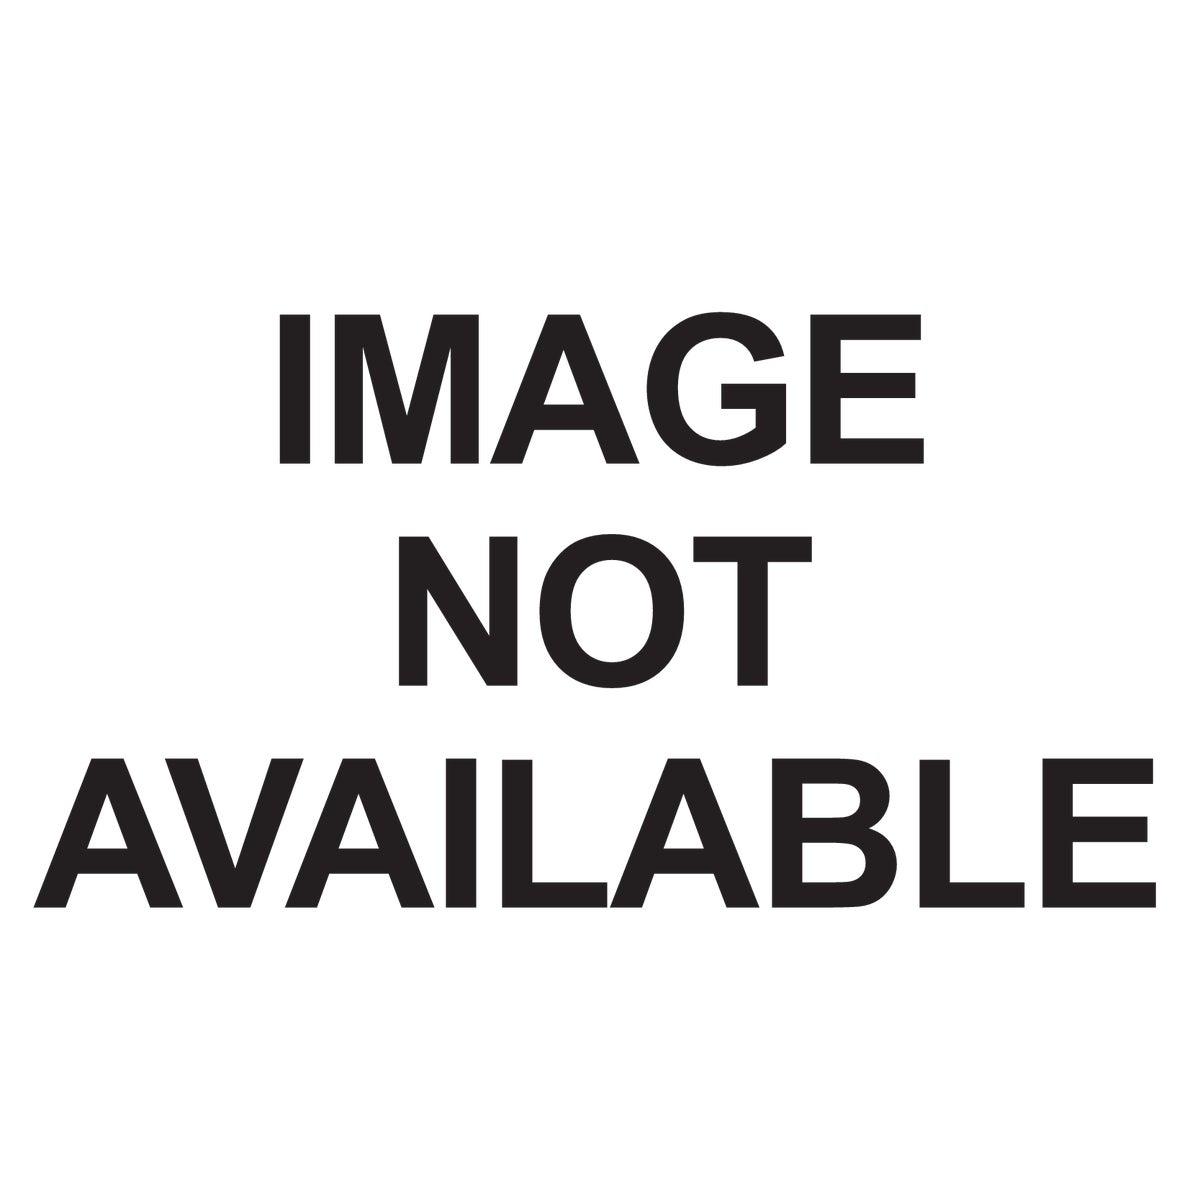 20 QT NURSERY MIX - WGM03202 by Waupaca Northwoods